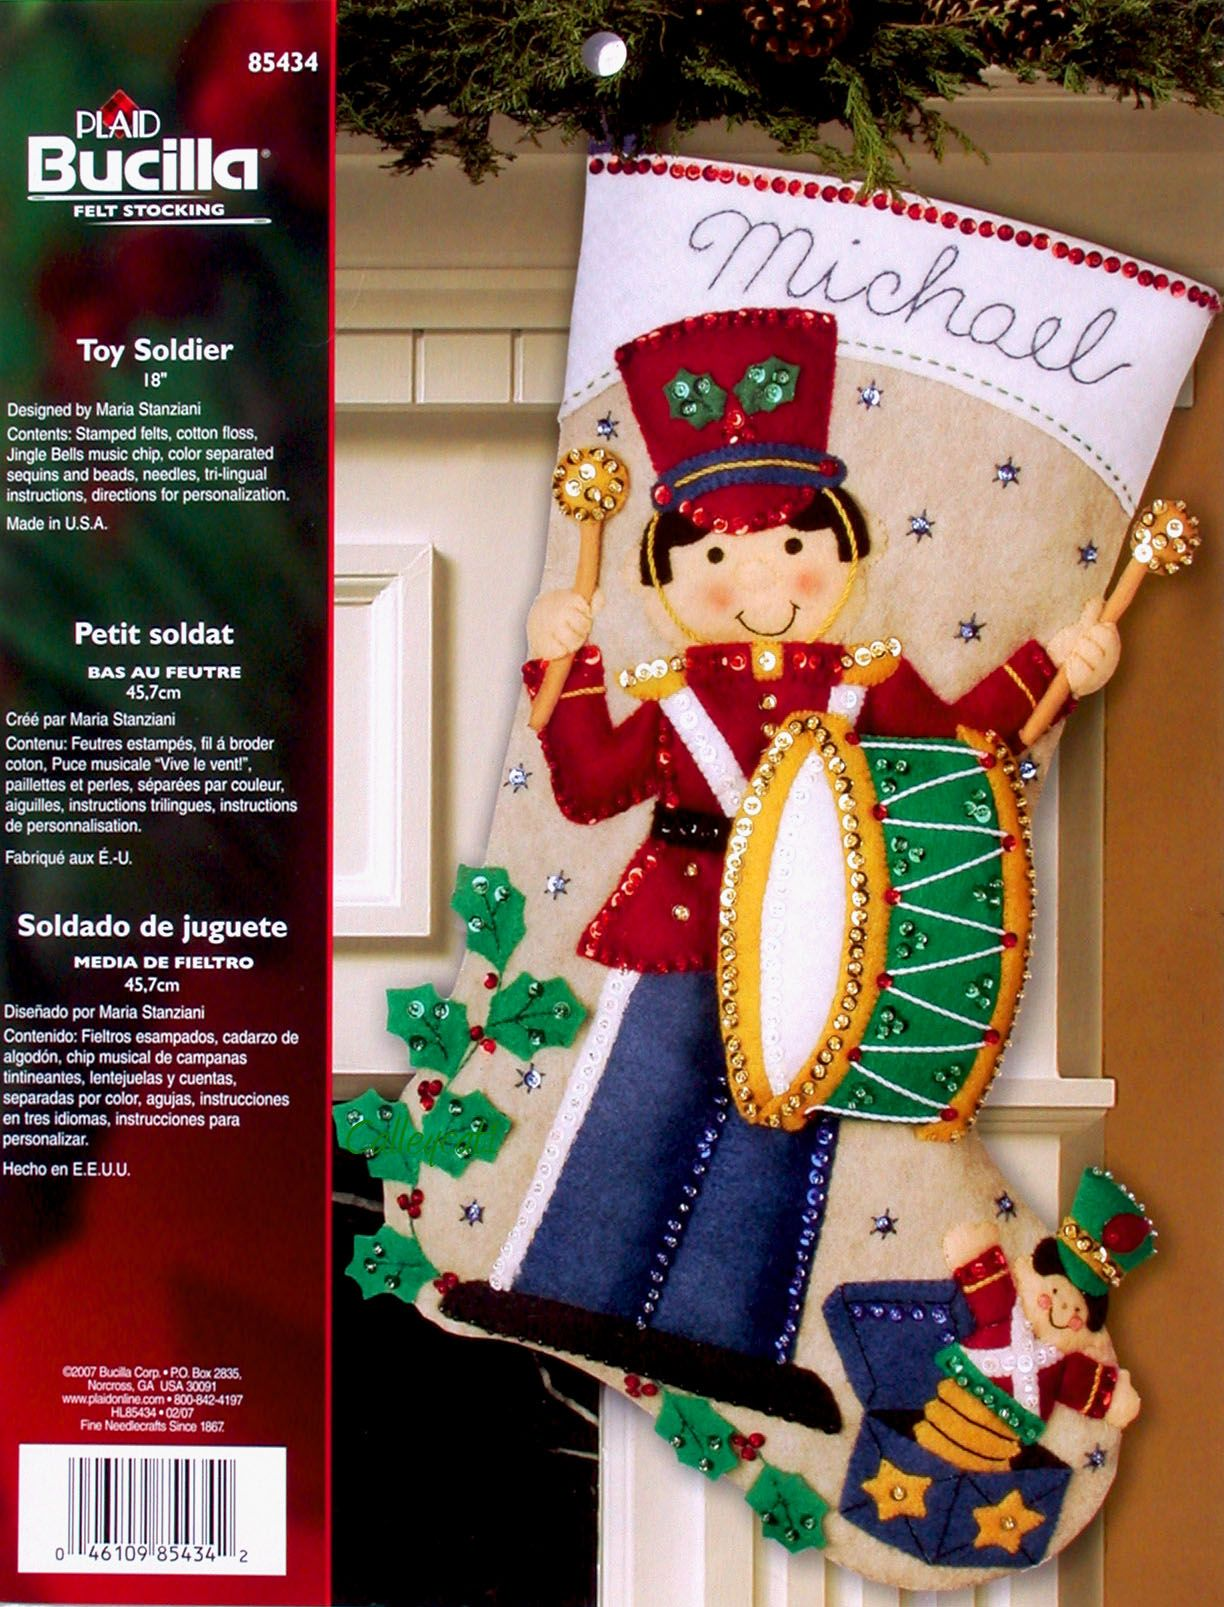 Bucilla Toy Soldier 18 Musical Felt Christmas Stocking Kit 85434